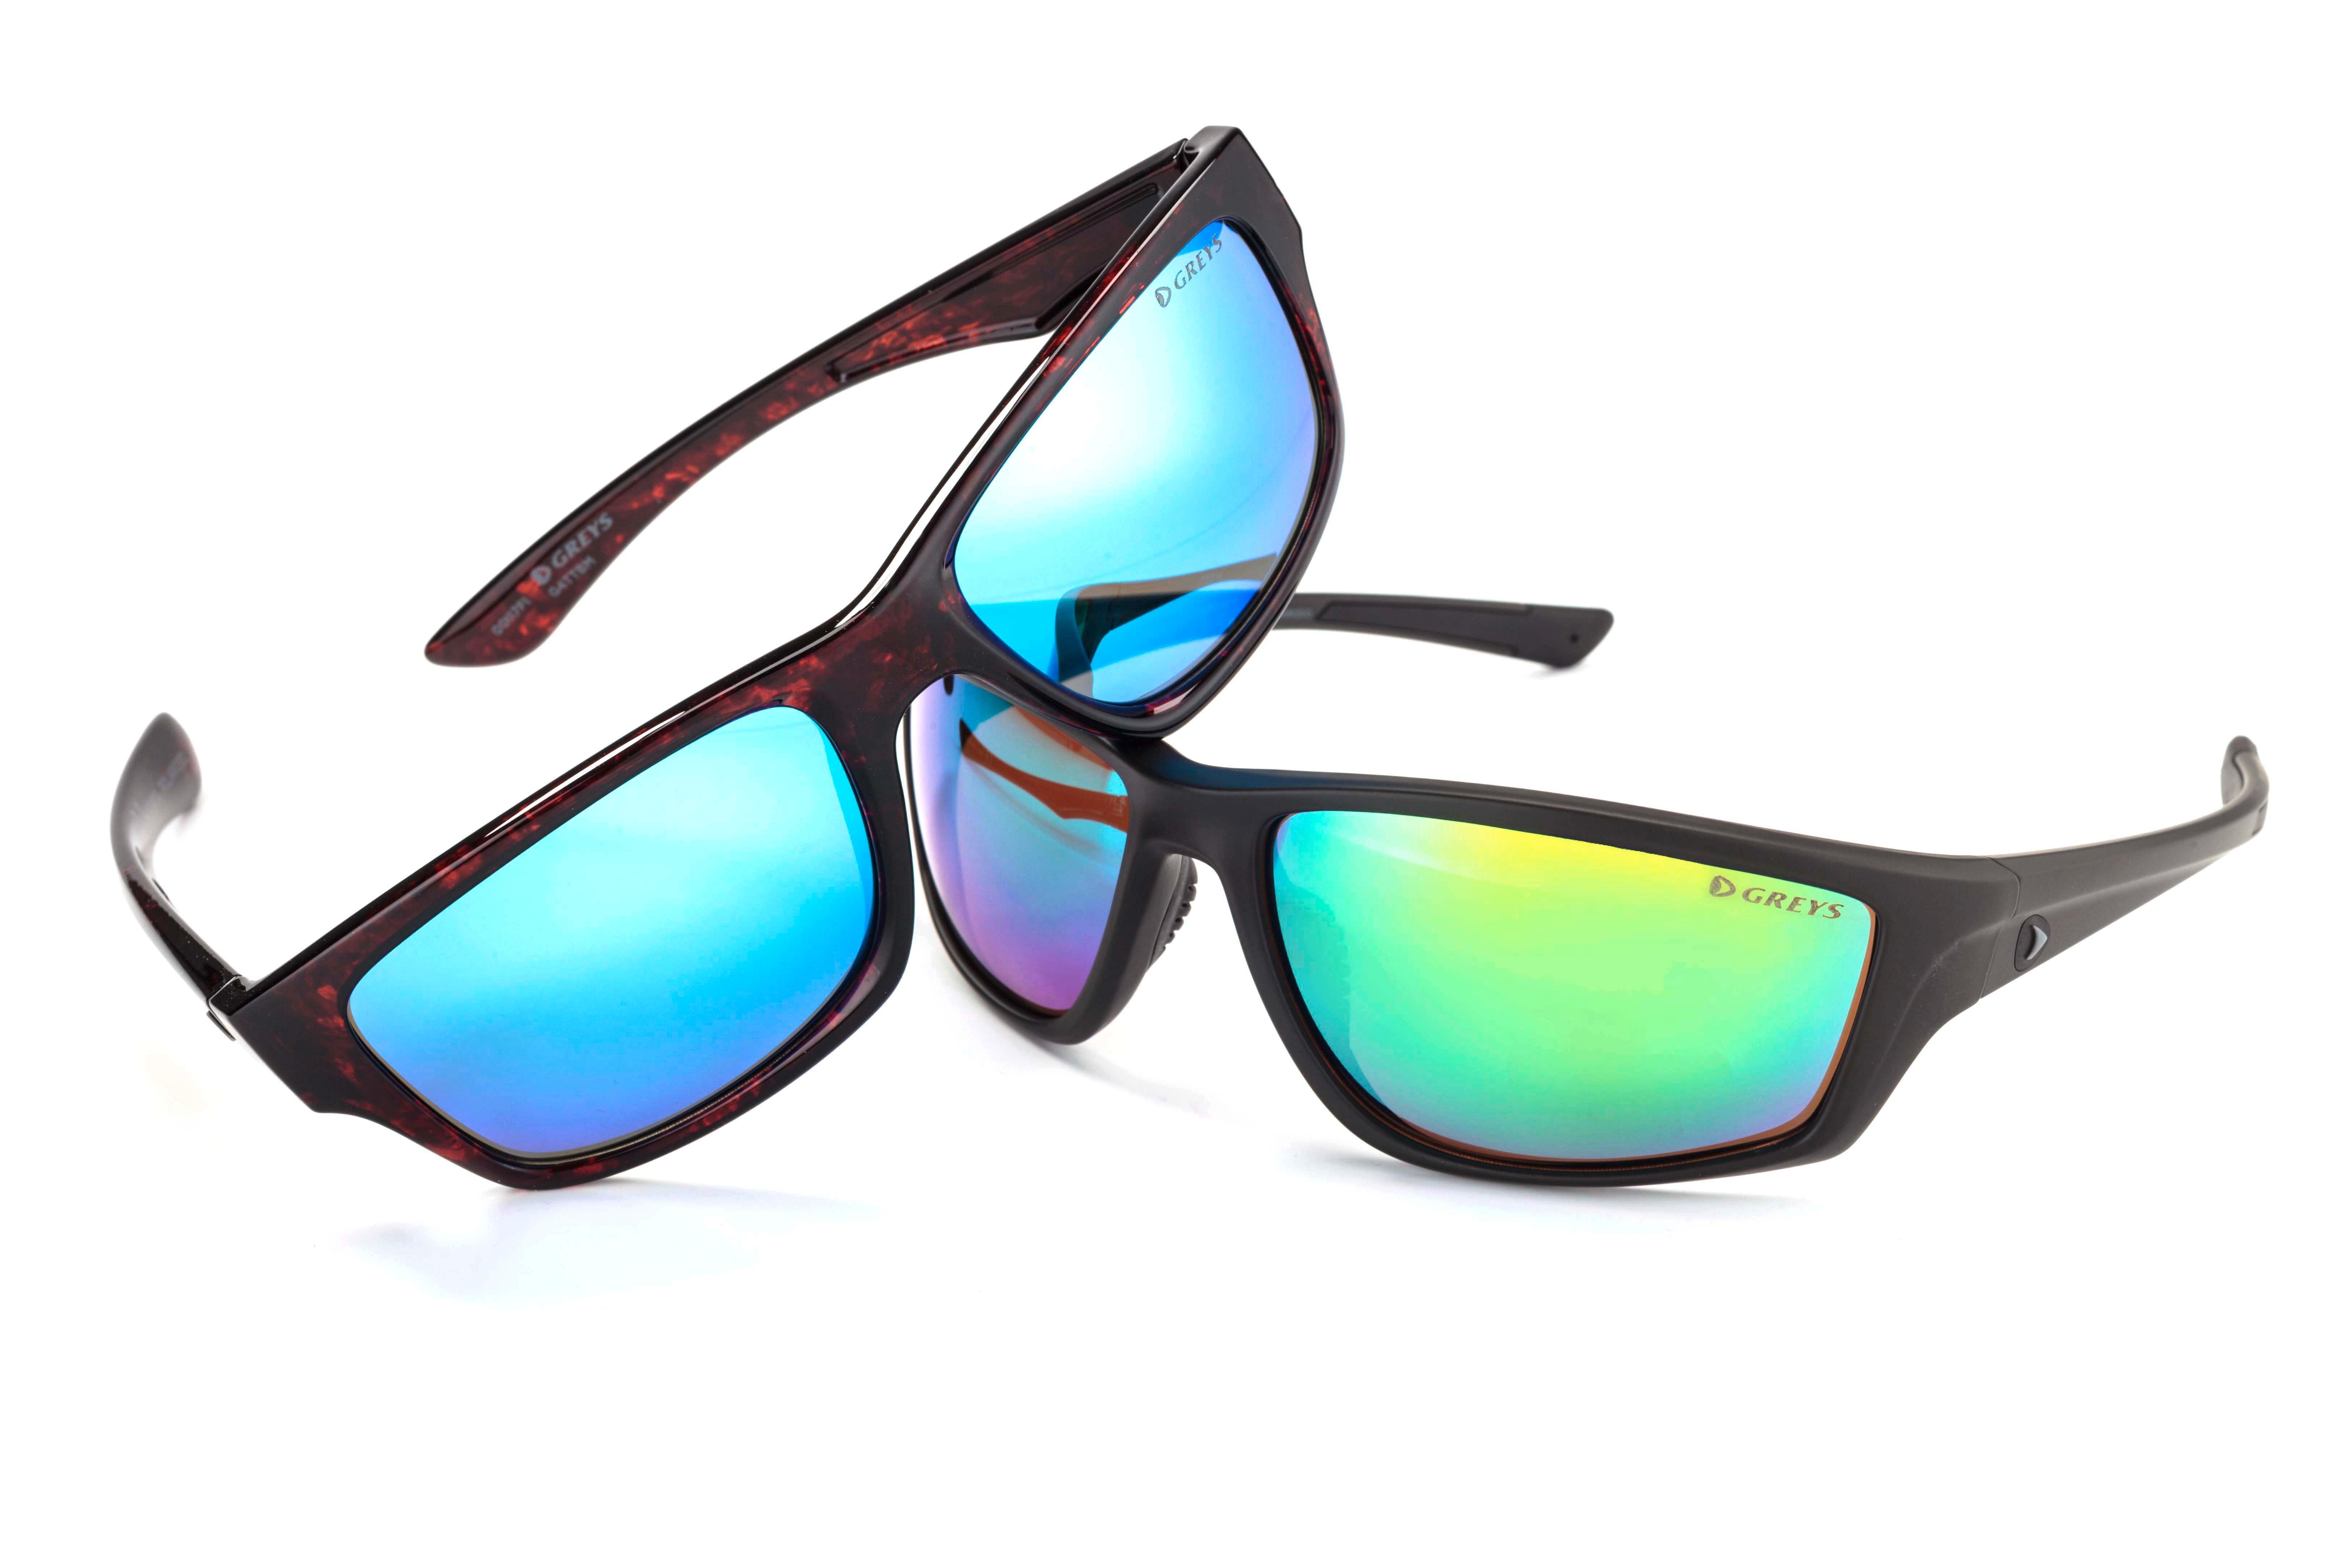 Greys sunglasses 1